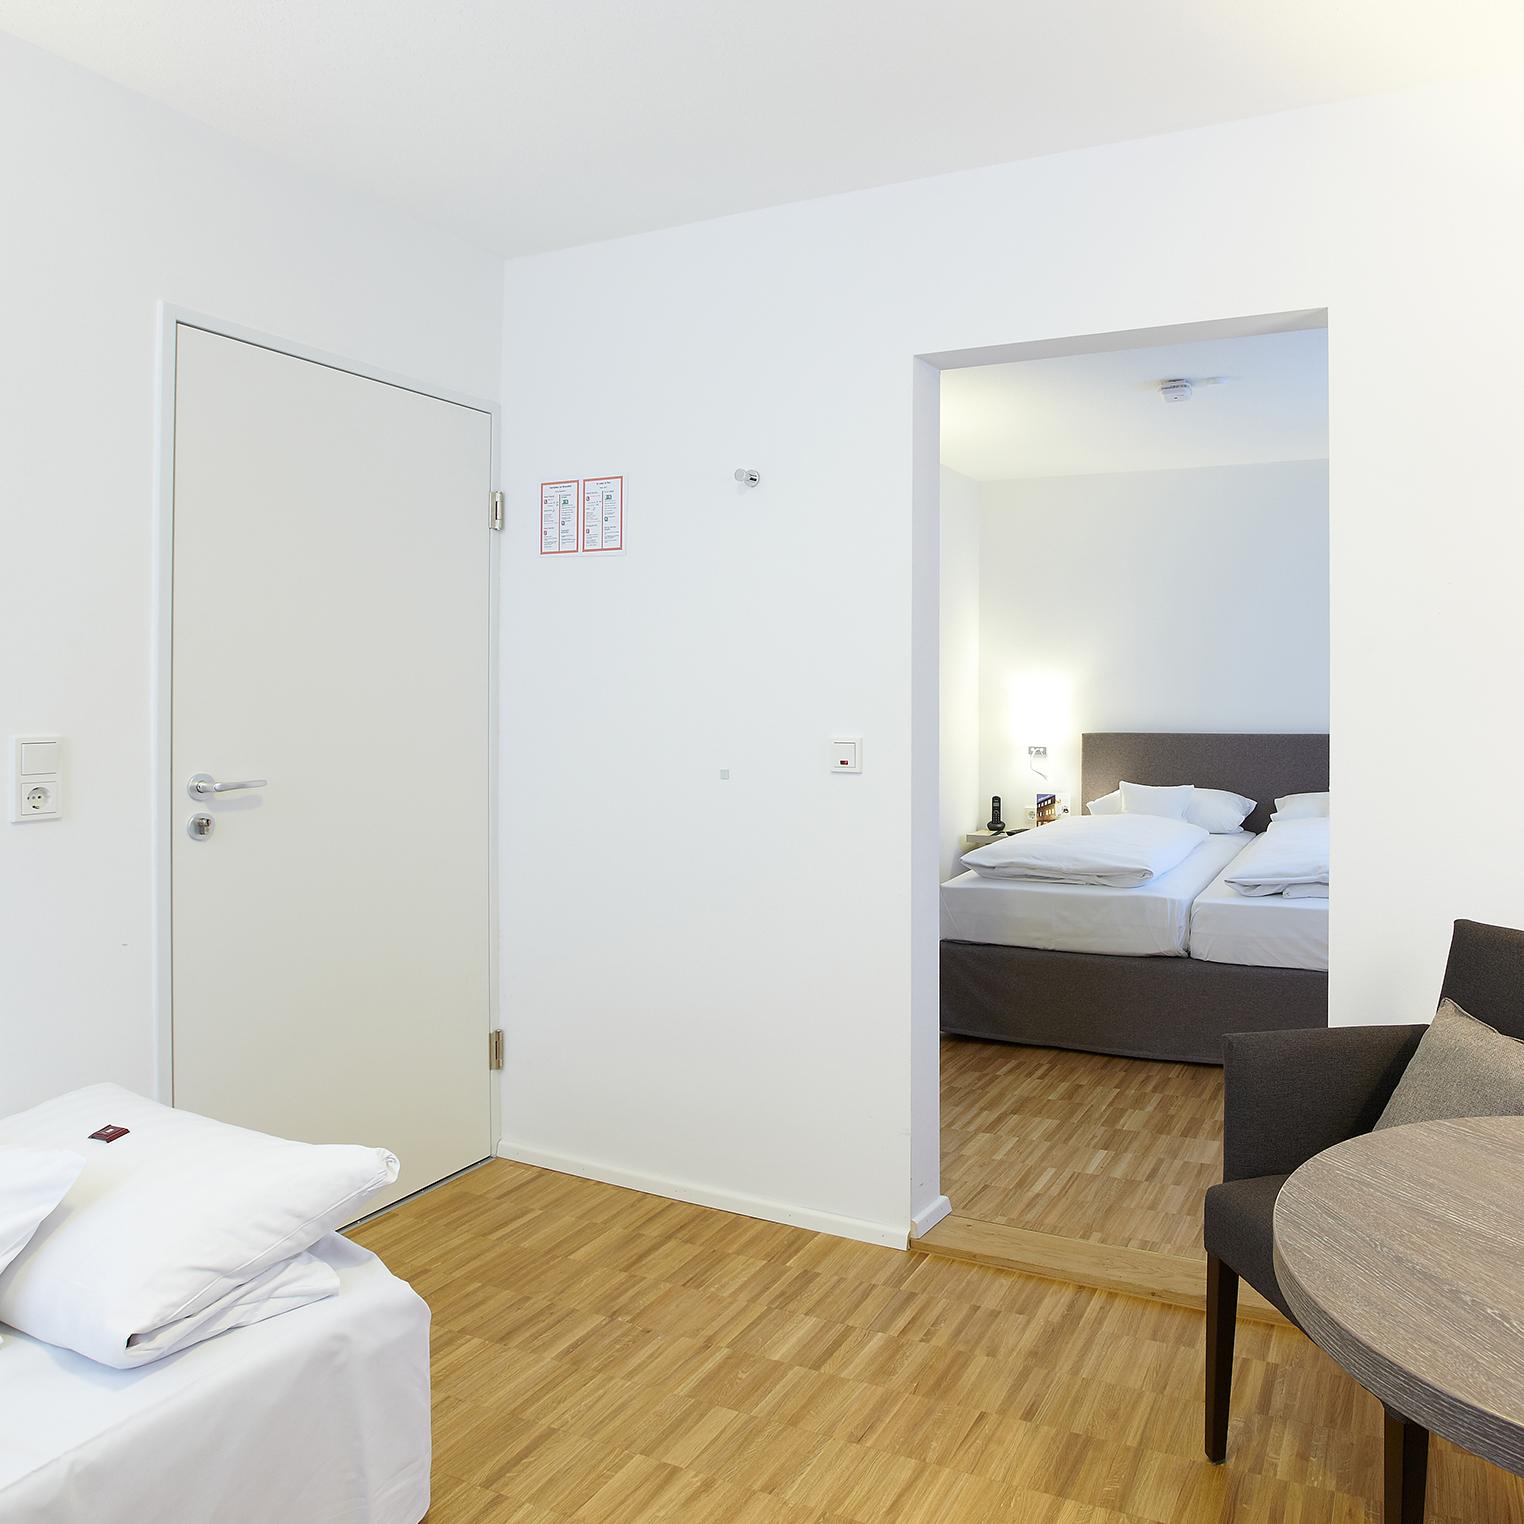 Hotel-Klingelhöffer-050115 17105_web